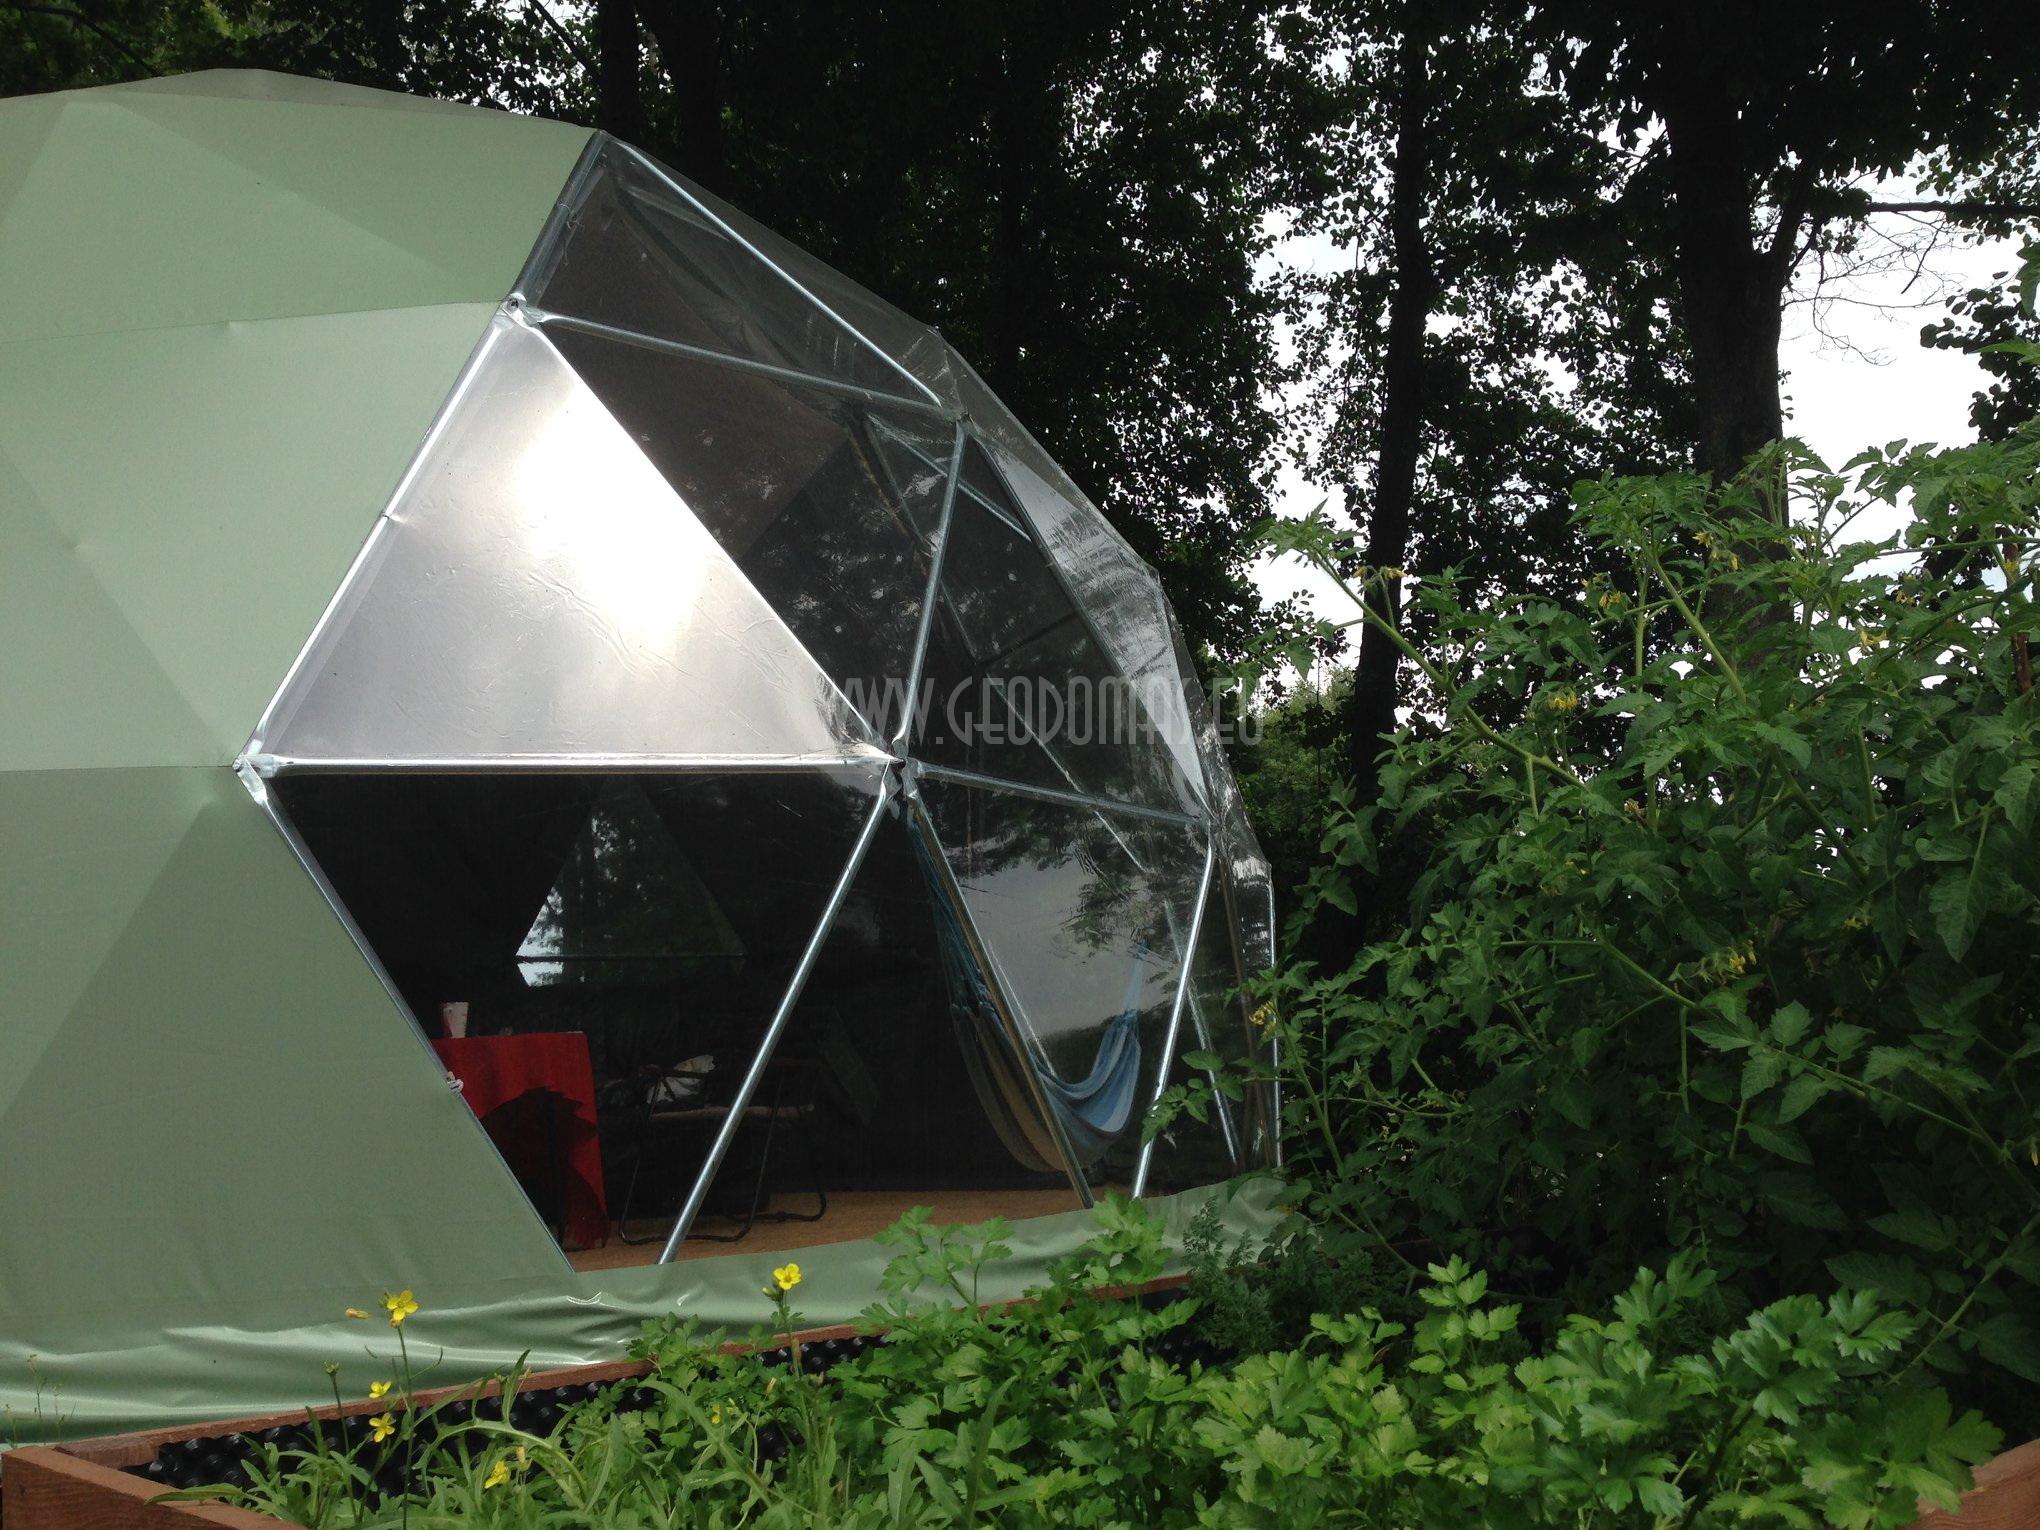 25m² Glamping Dome Ø5,5m F3 | Poland, Olsztyn